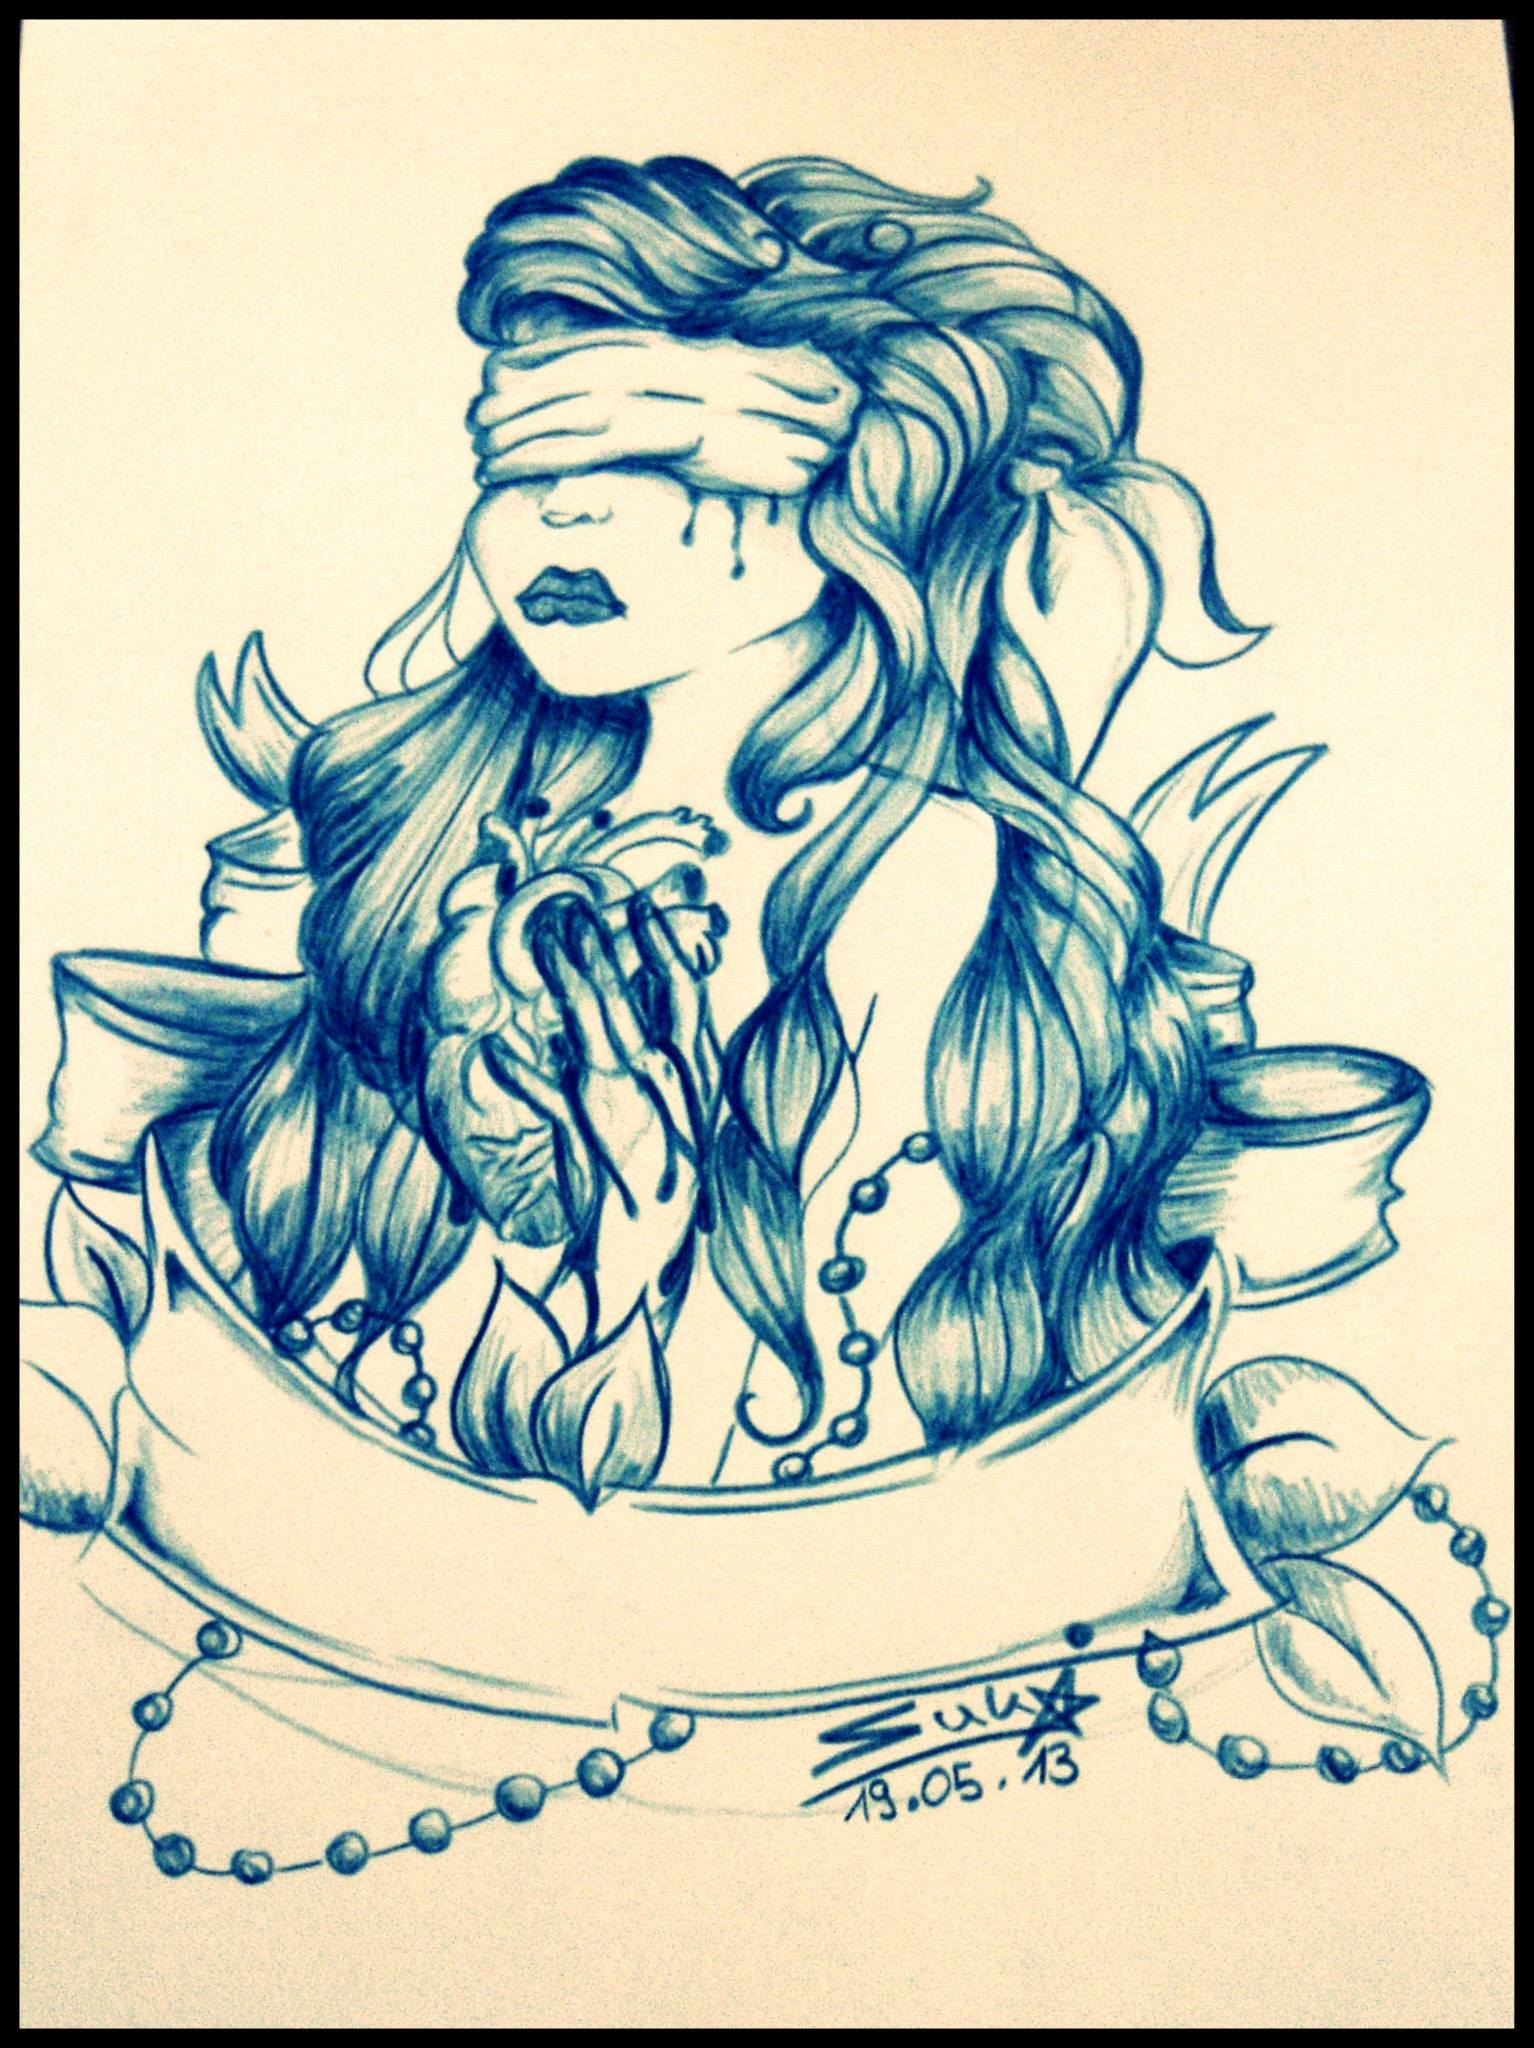 Brokenhearted Girl Tattoo Design by Sukis-Brain-Artwork on